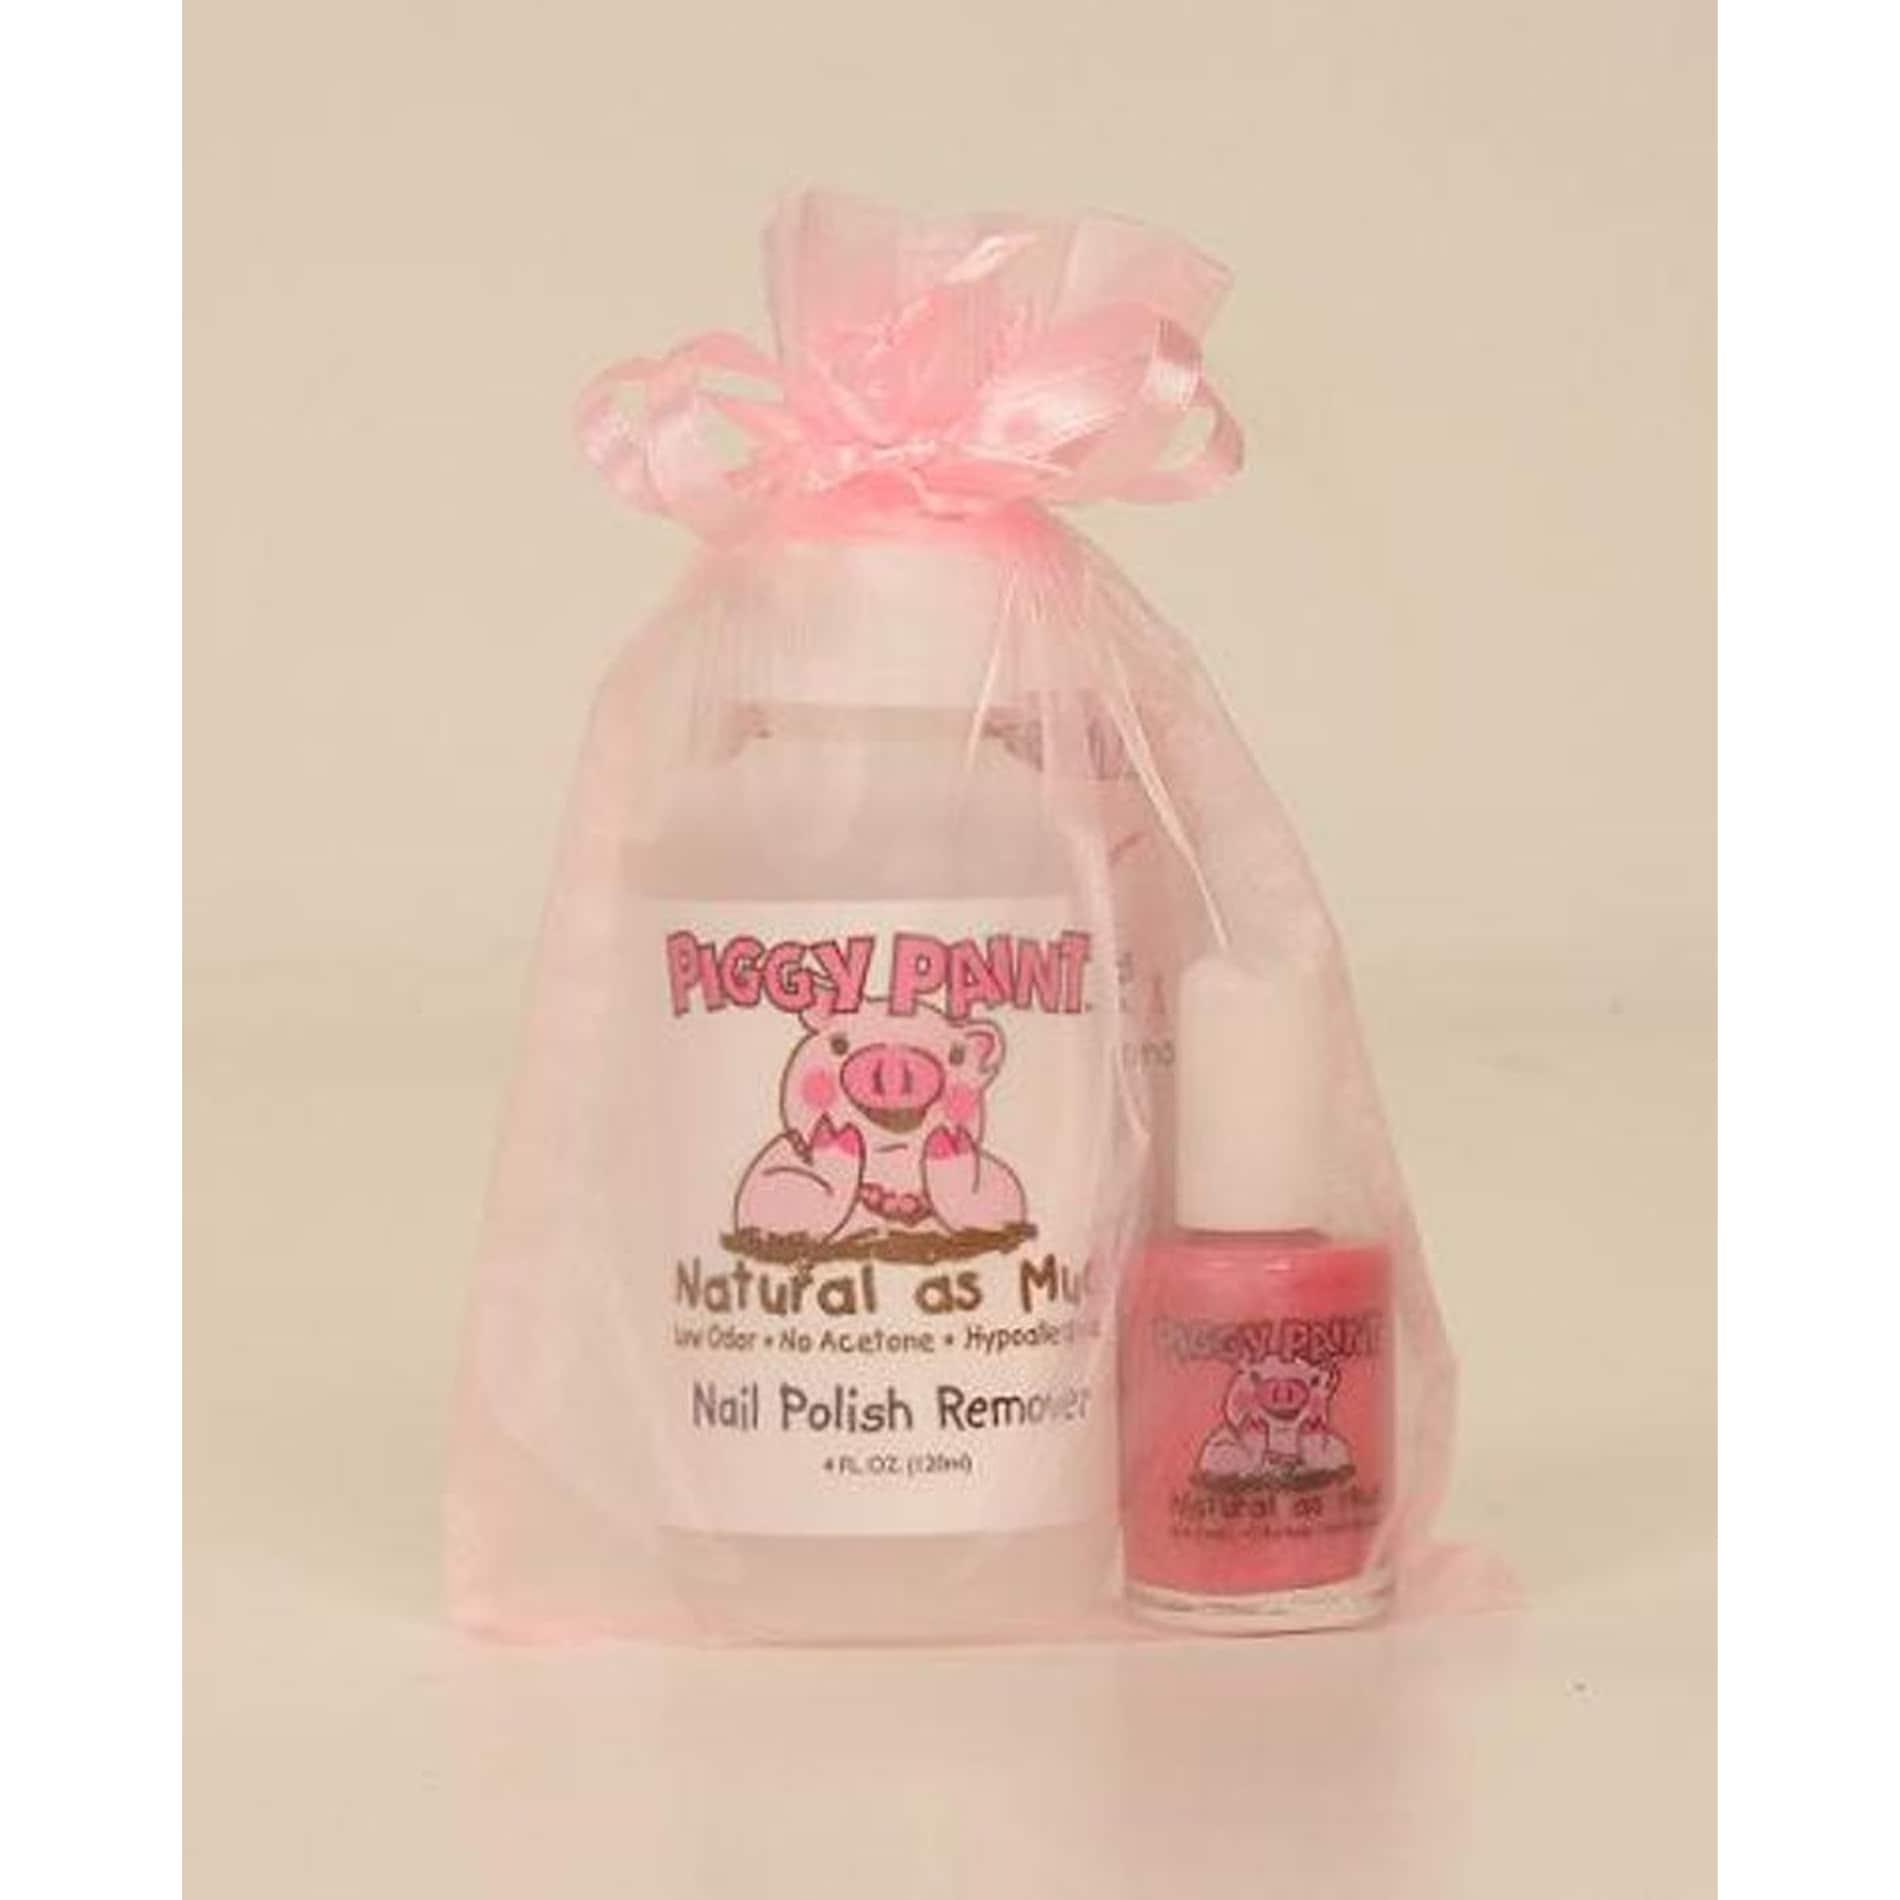 Piggy Paints Non-toxic 'Forever Fancy' Nail Polish Set